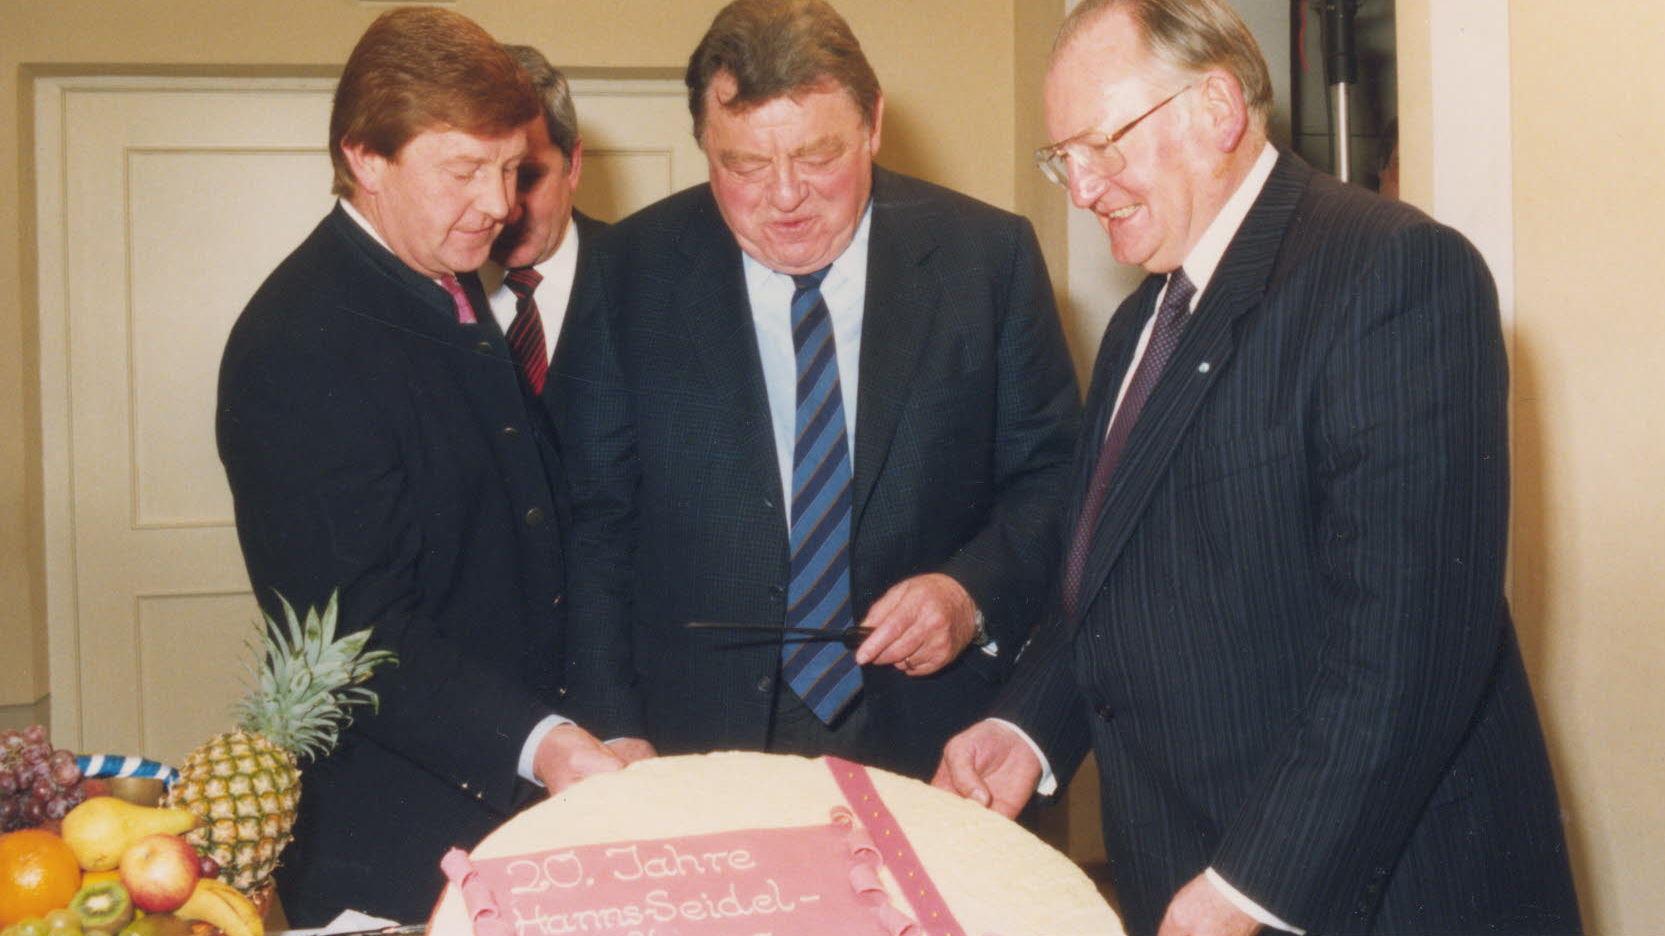 20-jähriges Jubiläum der Hanns-Seidel-Stiftung